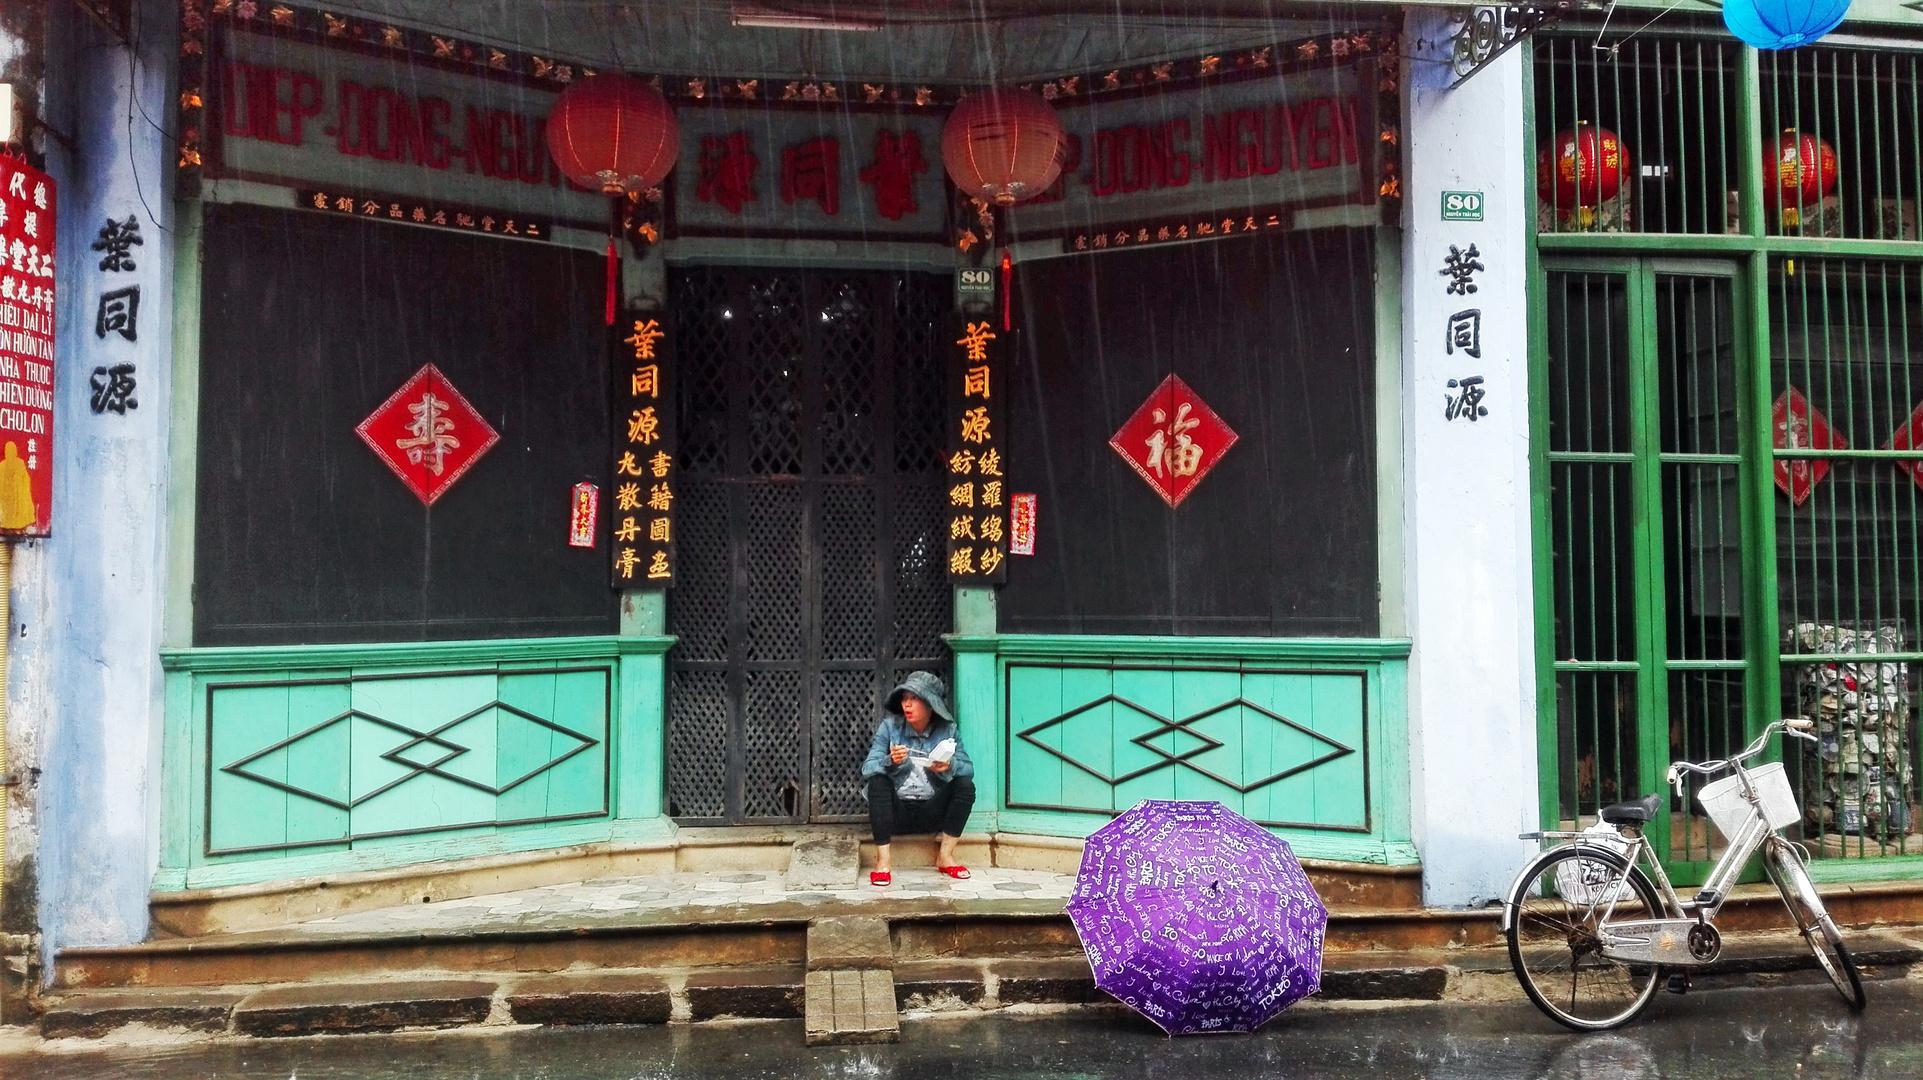 VIETNAM - Pioggia ad Hoi An